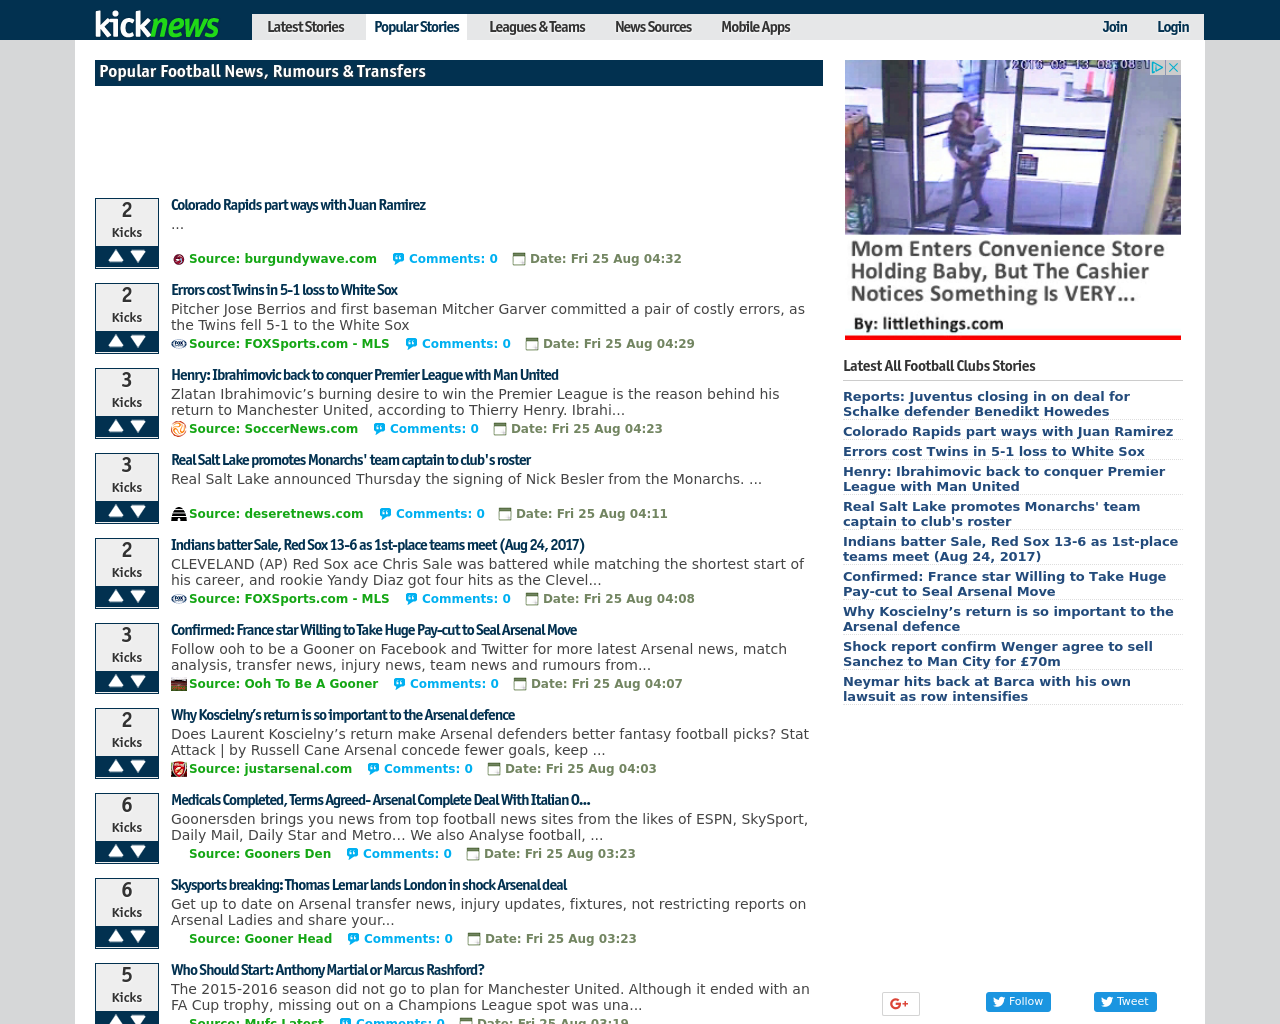 Kicknews-Advertising-Reviews-Pricing